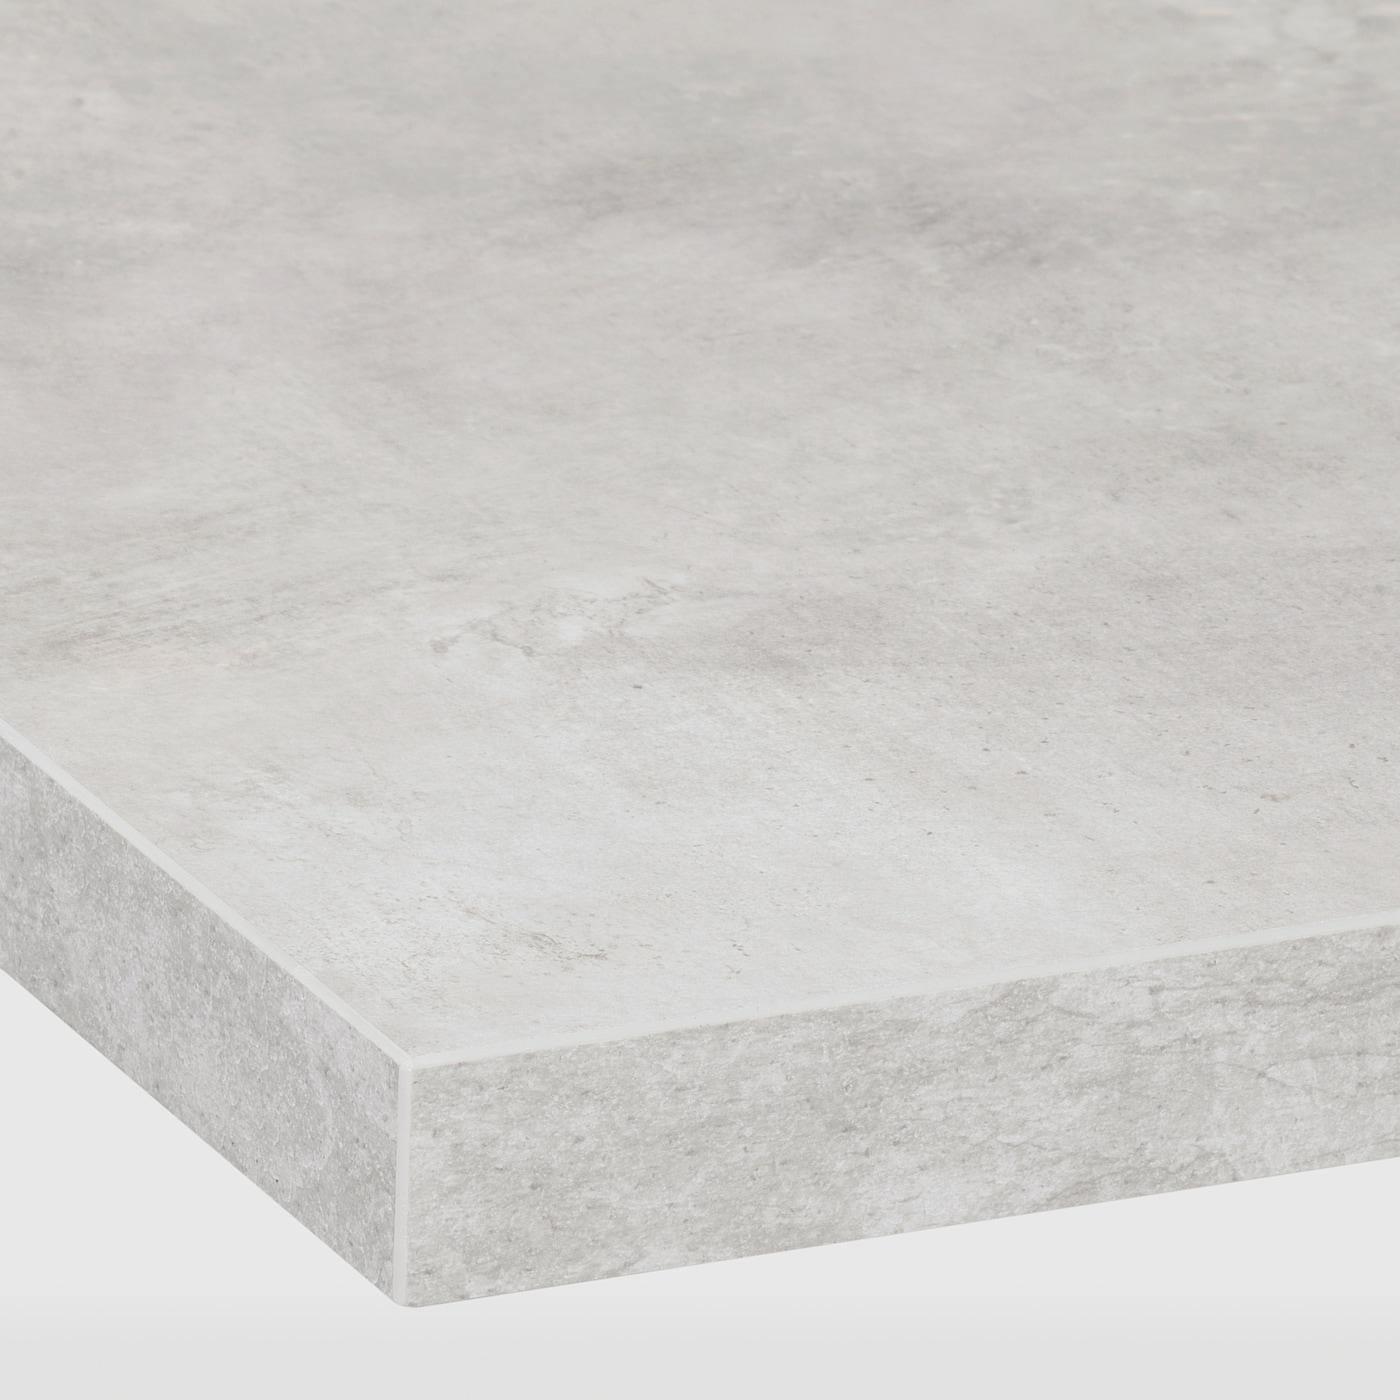 EKBACKEN Worktop - light grey concrete effect/laminate 4x4.4 cm